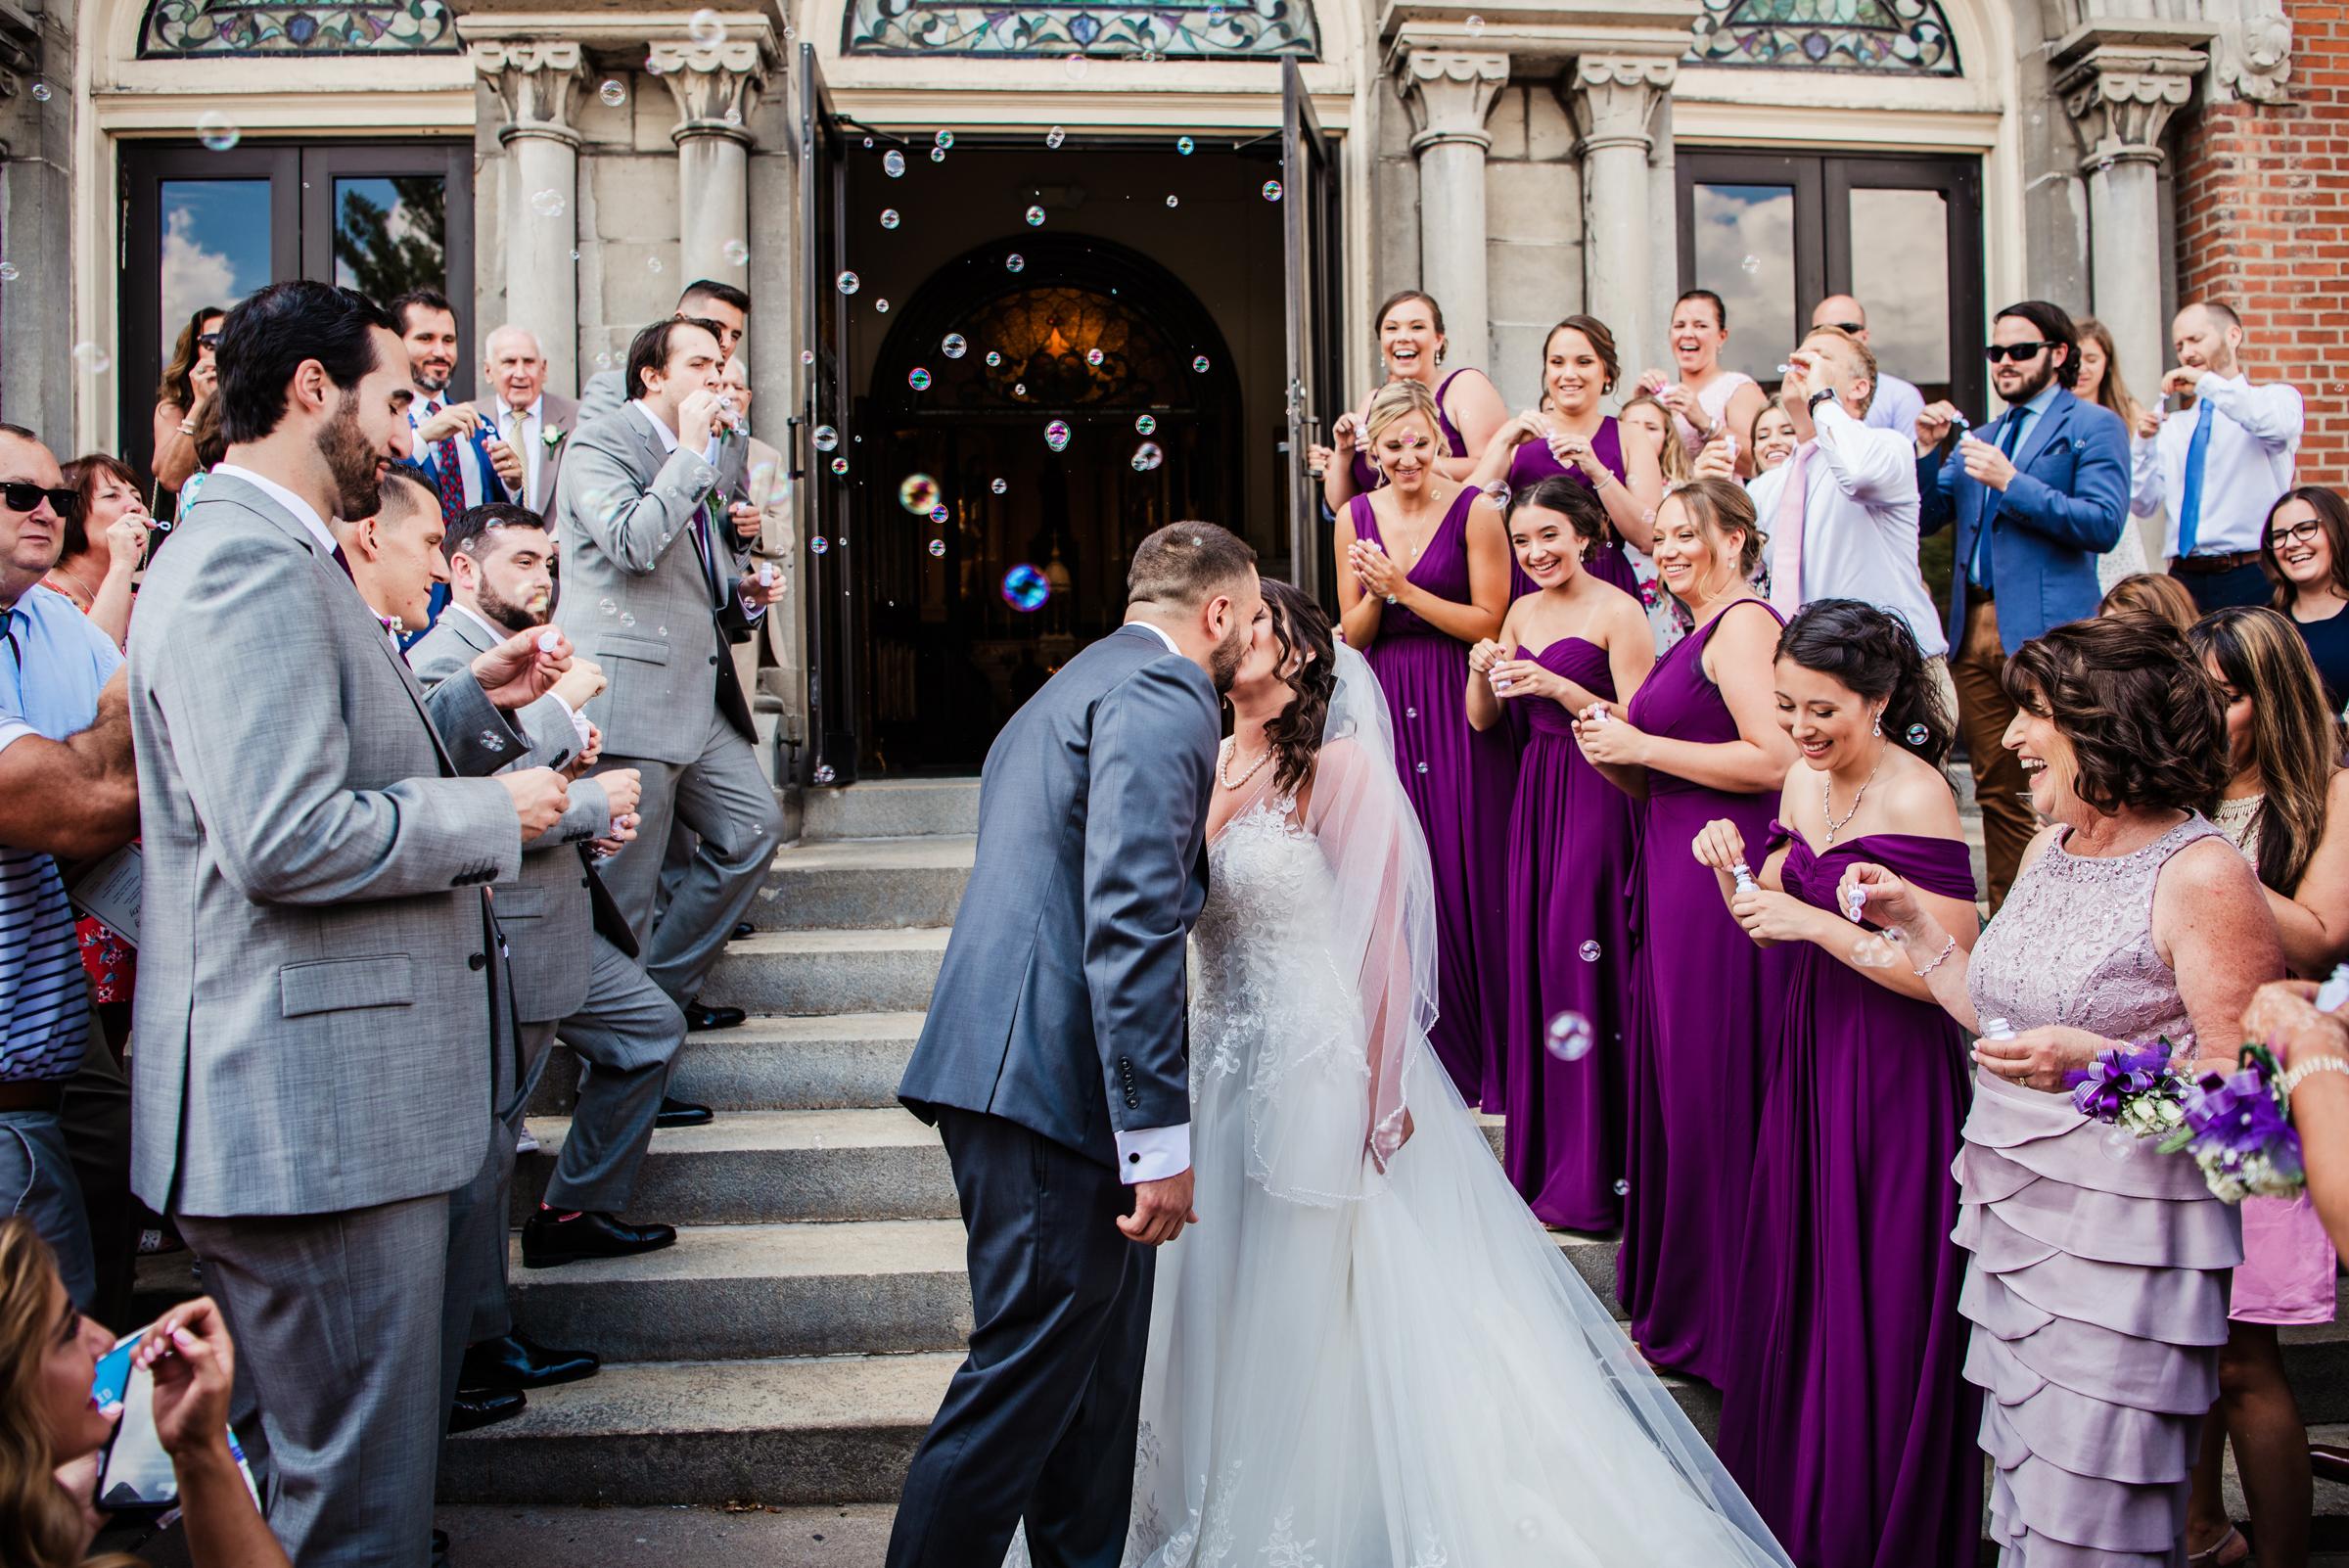 Historic_Old_St_Johns_Church_Valentinos_Banquet_Hall_Central_NY_Wedding_JILL_STUDIO_Rochester_NY_Photographer_DSC_5892.jpg